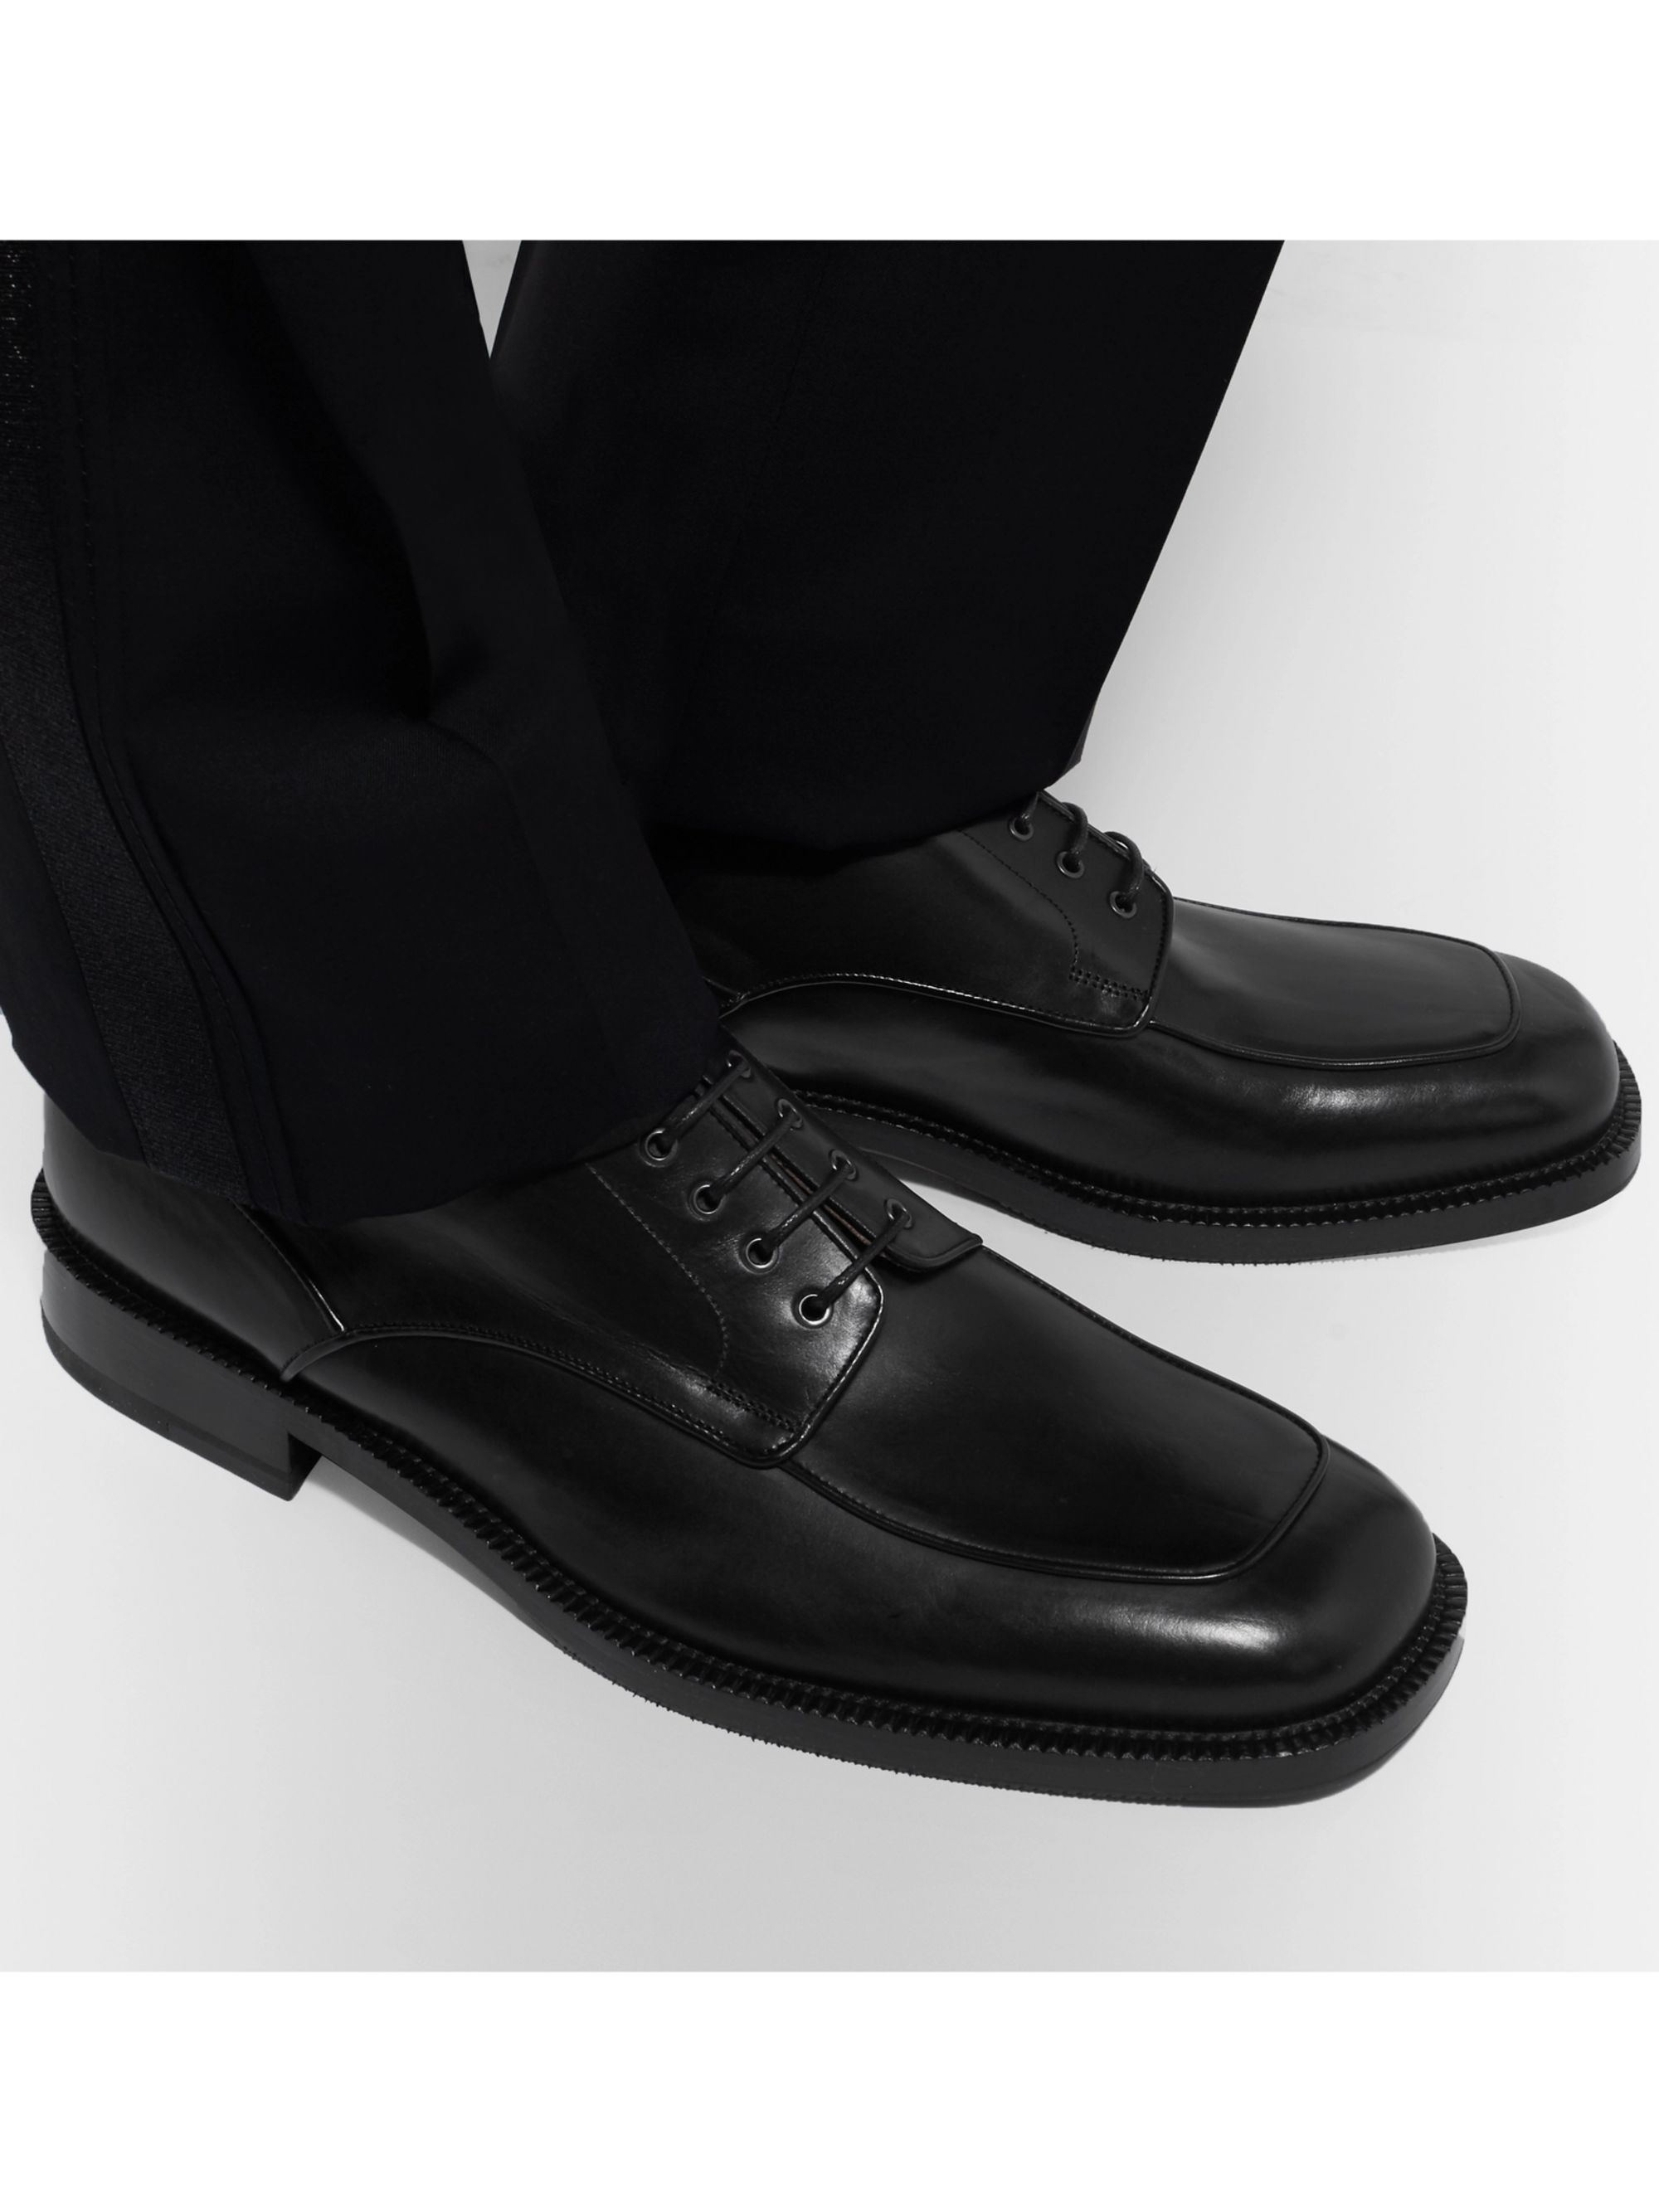 Black Polished Leather Derby Shoes | Dries Van Noten | MR PORTER